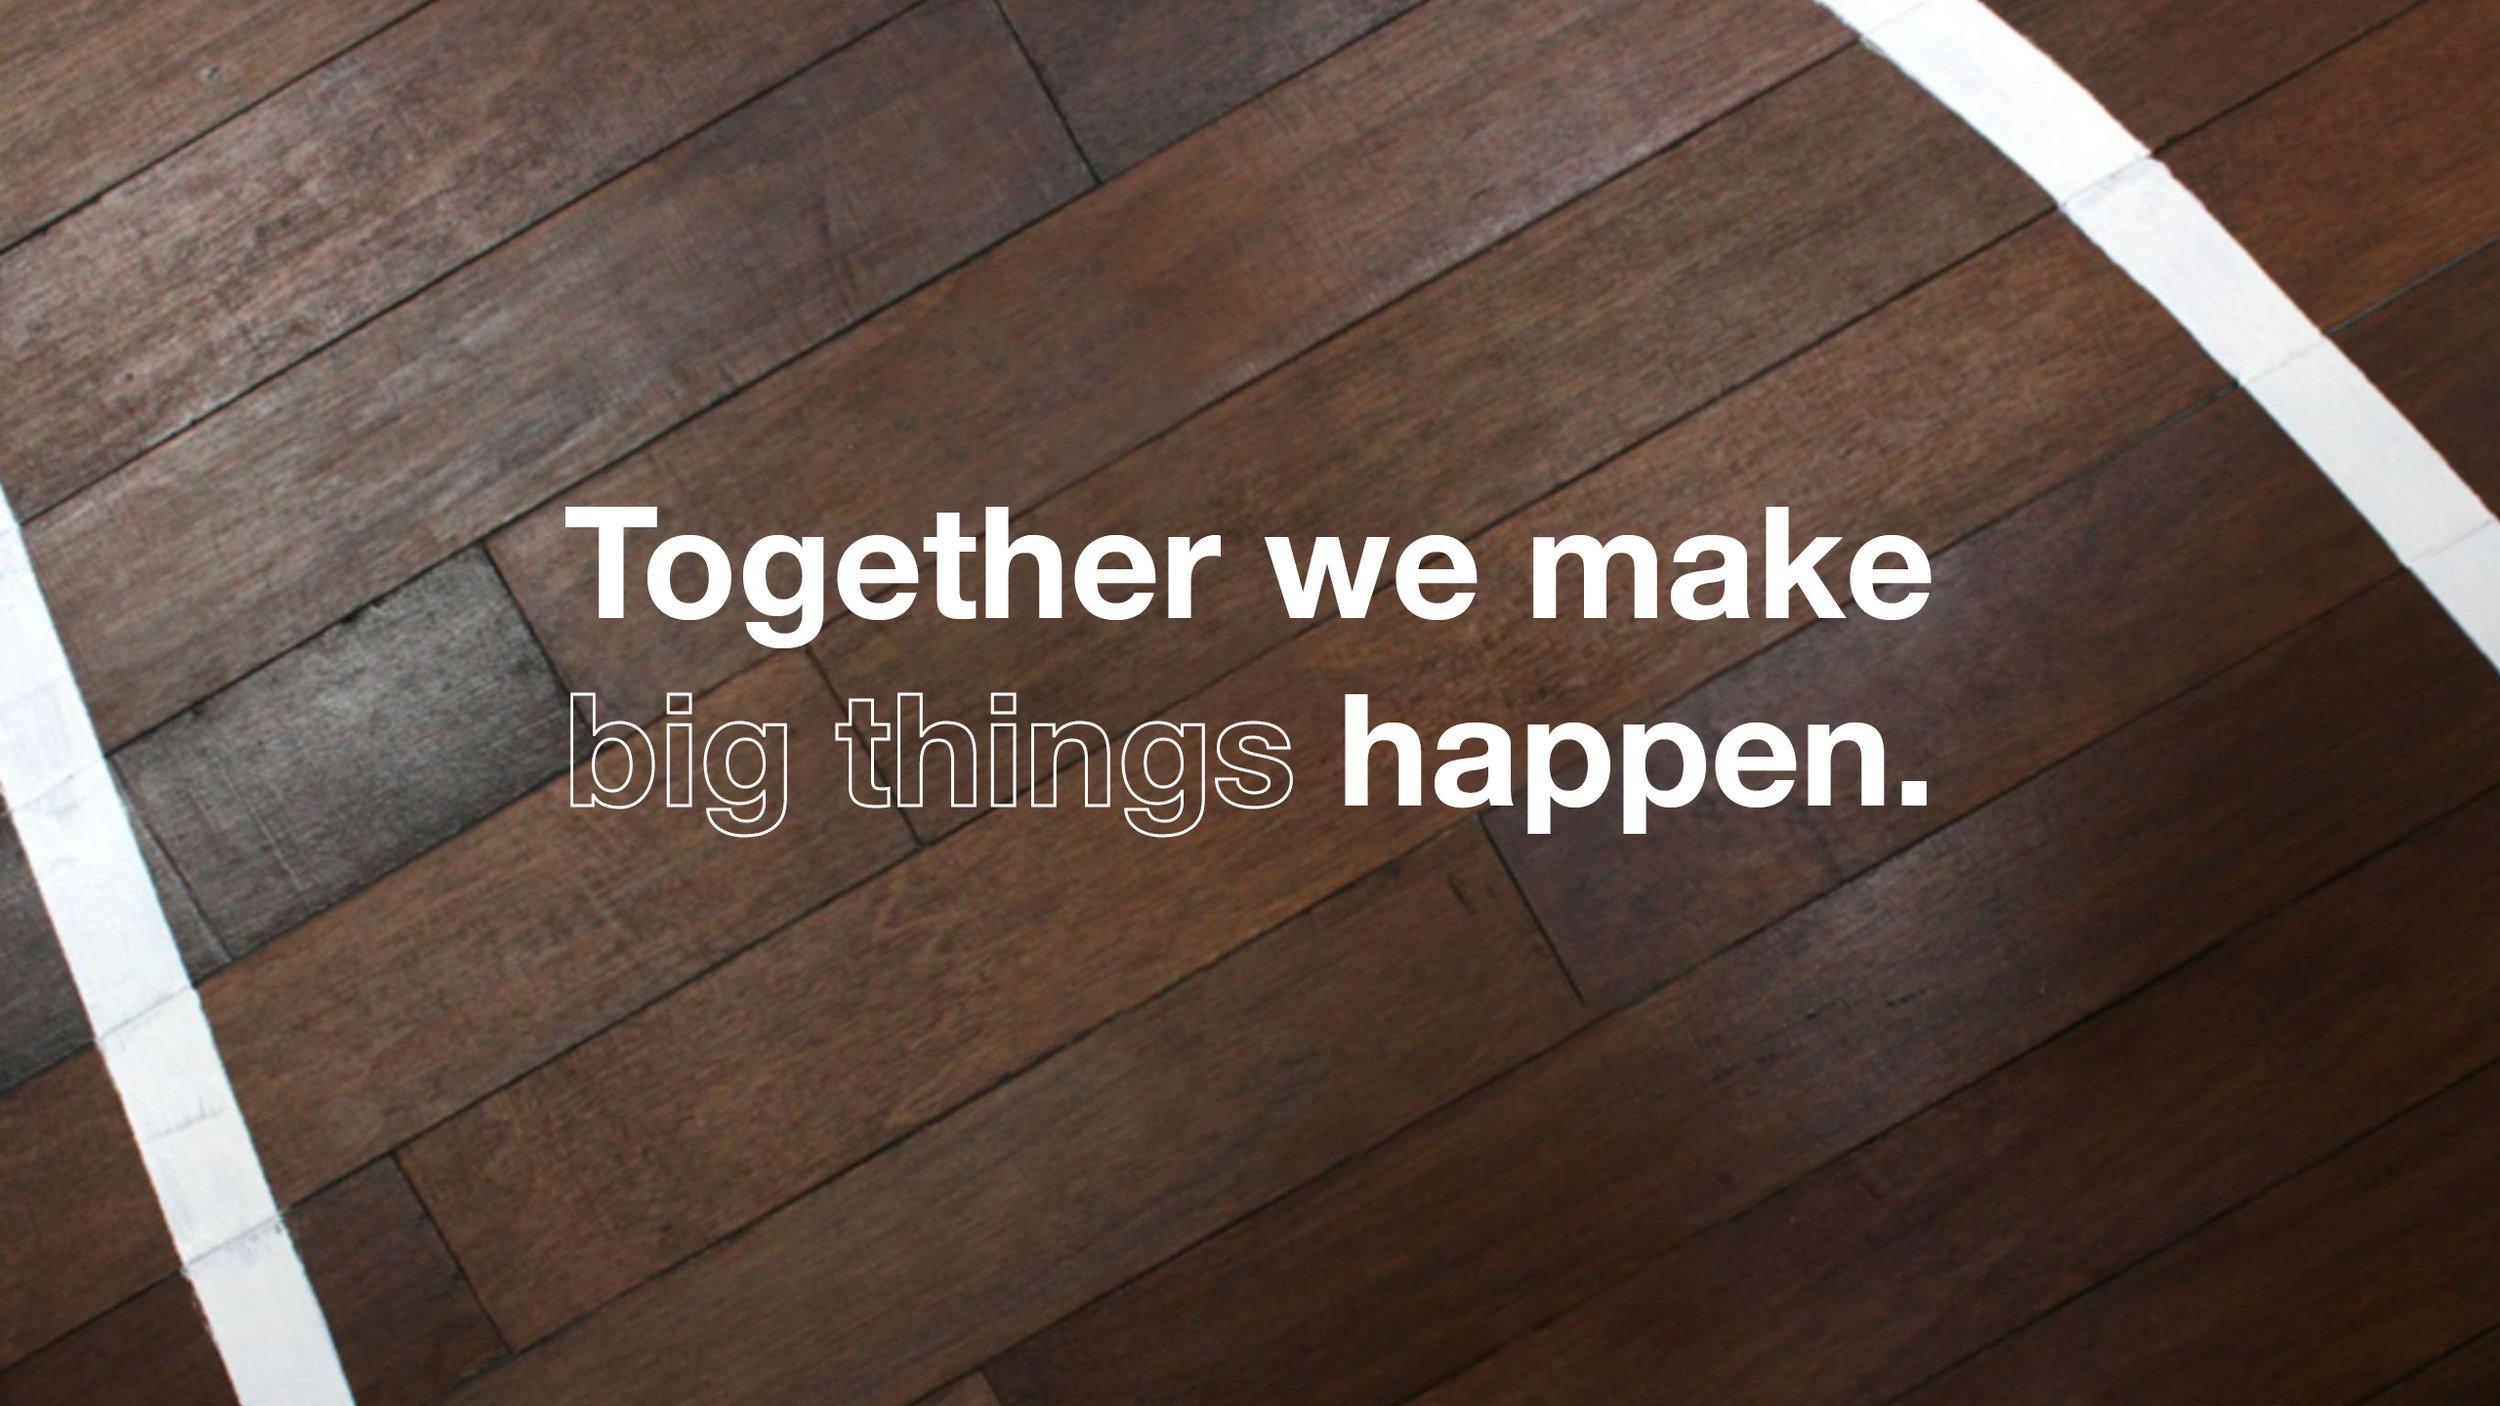 dutch-founders-fund-together-we-make-big-things-happen-marketing-schmarketing